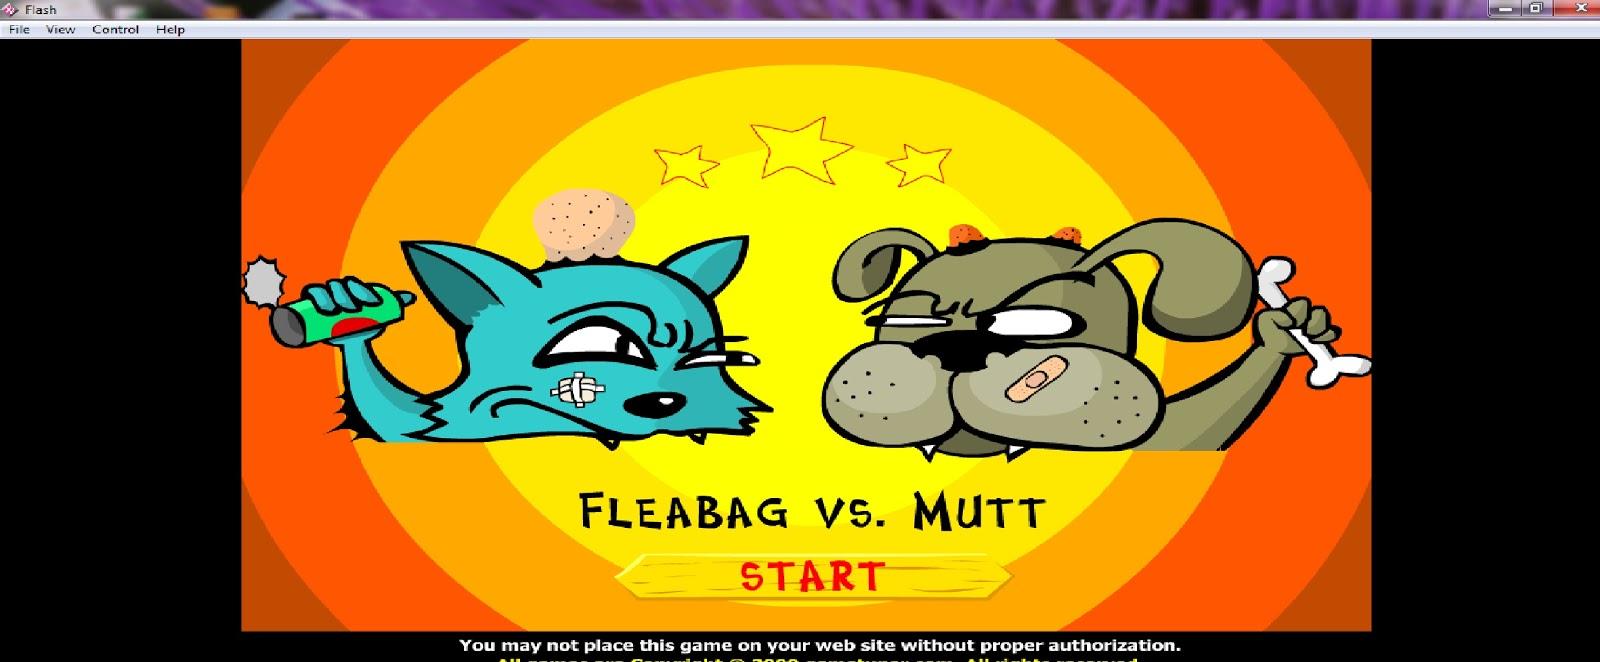 Fleabag vs mutt #y8 youtube.